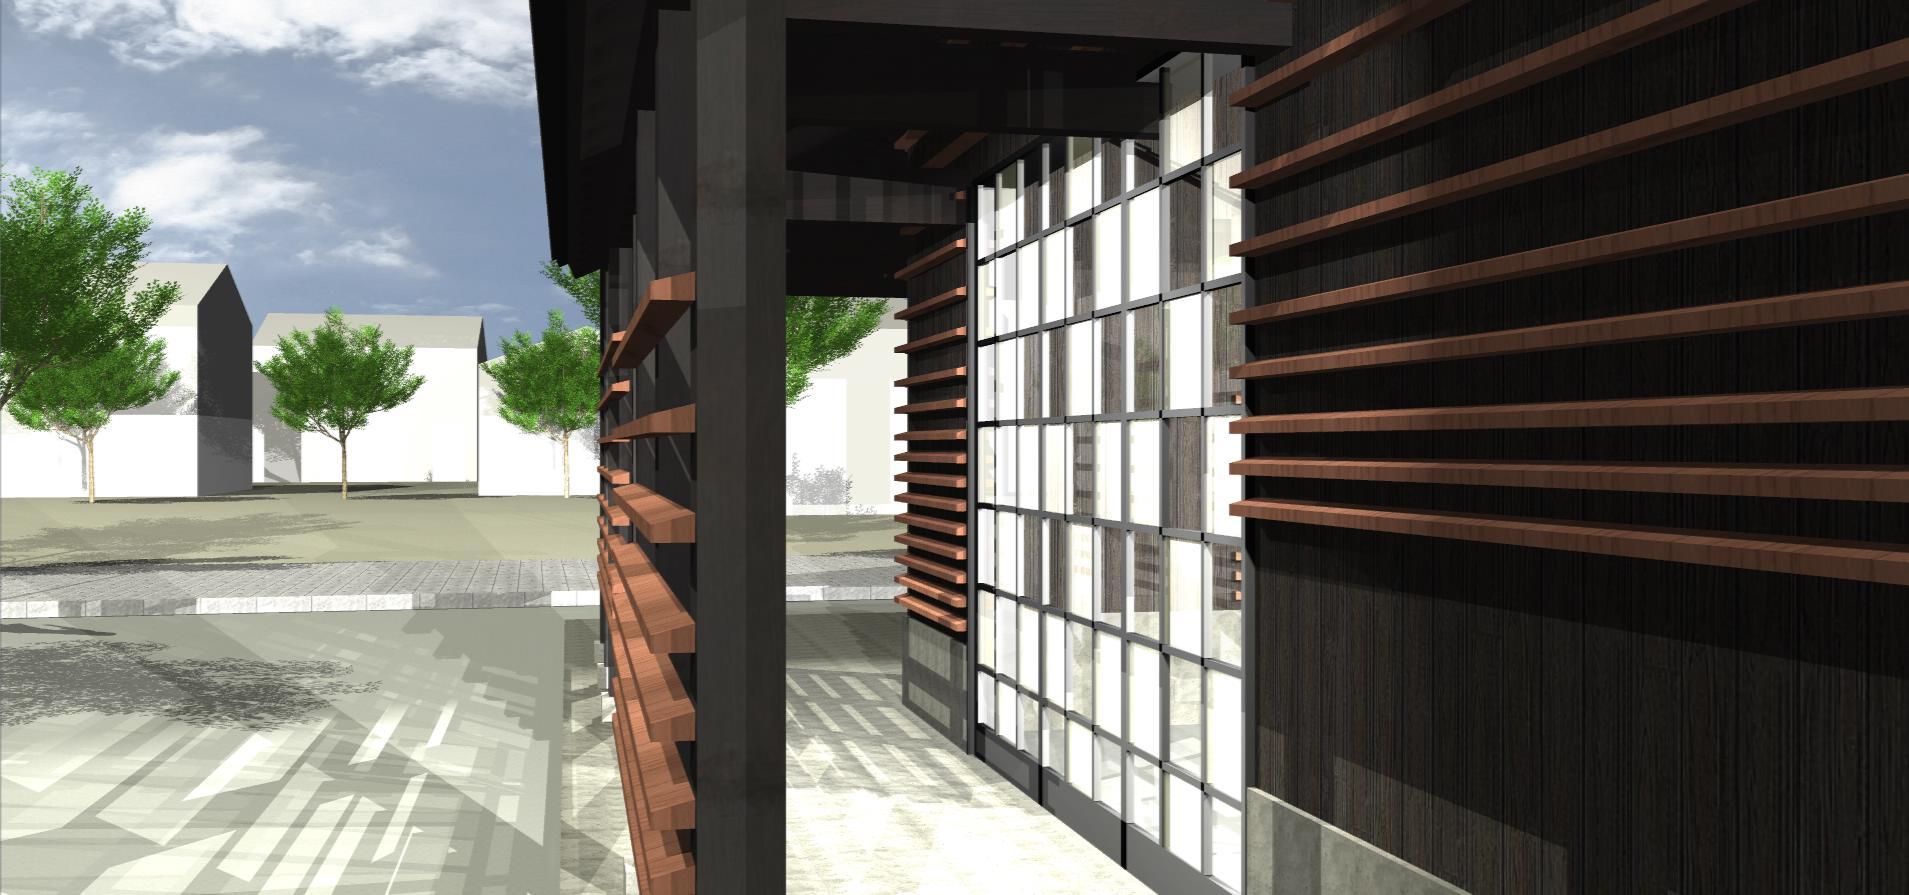 3Dパース | 玉造温泉観光案内所006